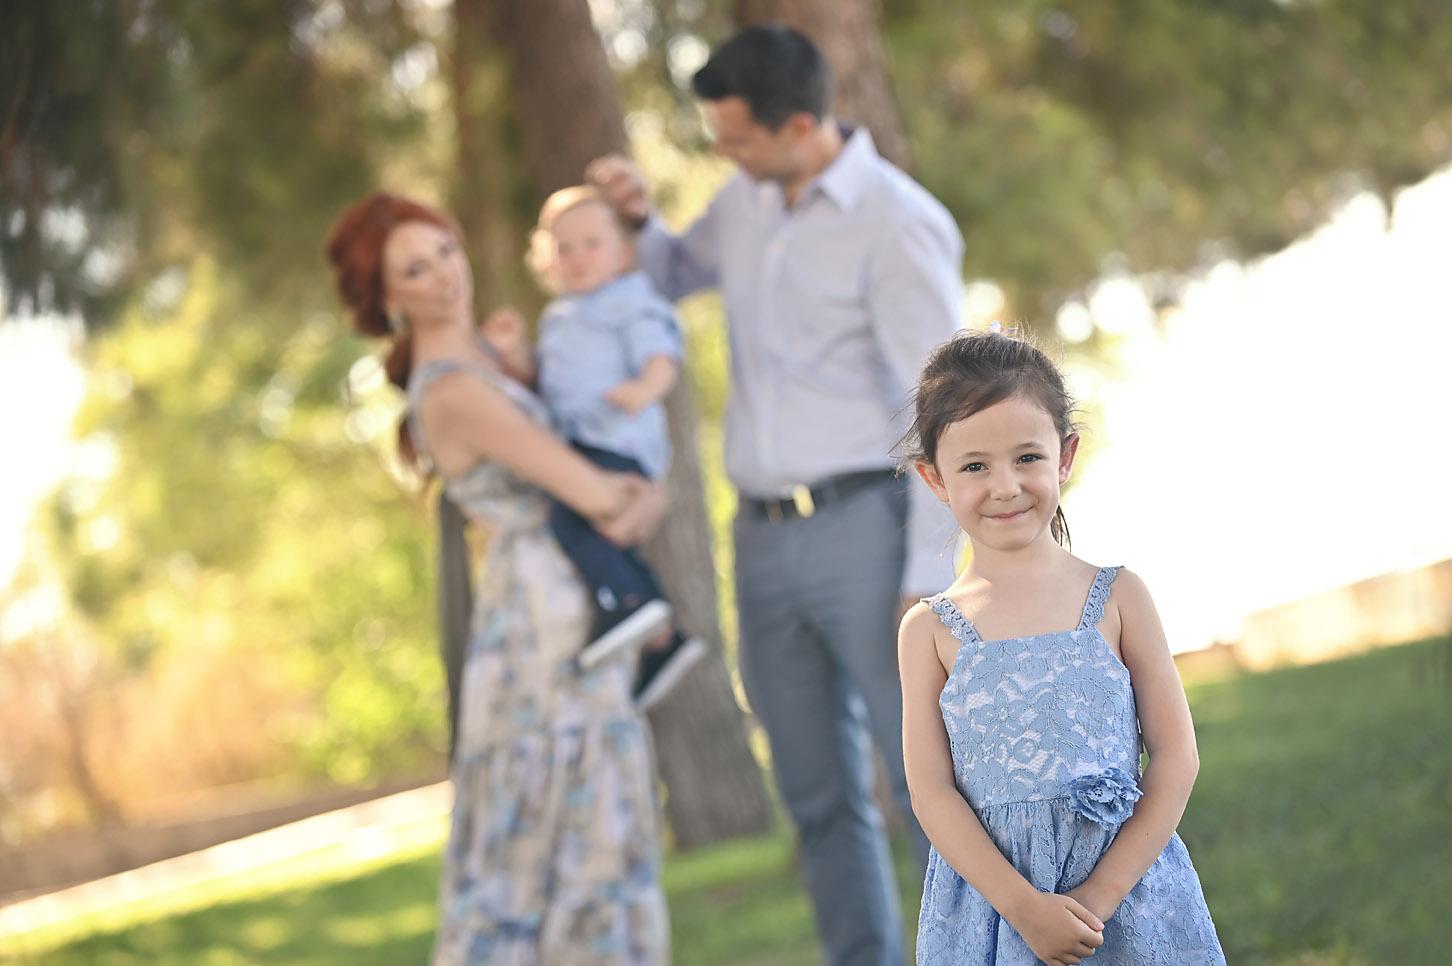 baptism-christening -family -potrtait-alexis-koumaditis-larissa